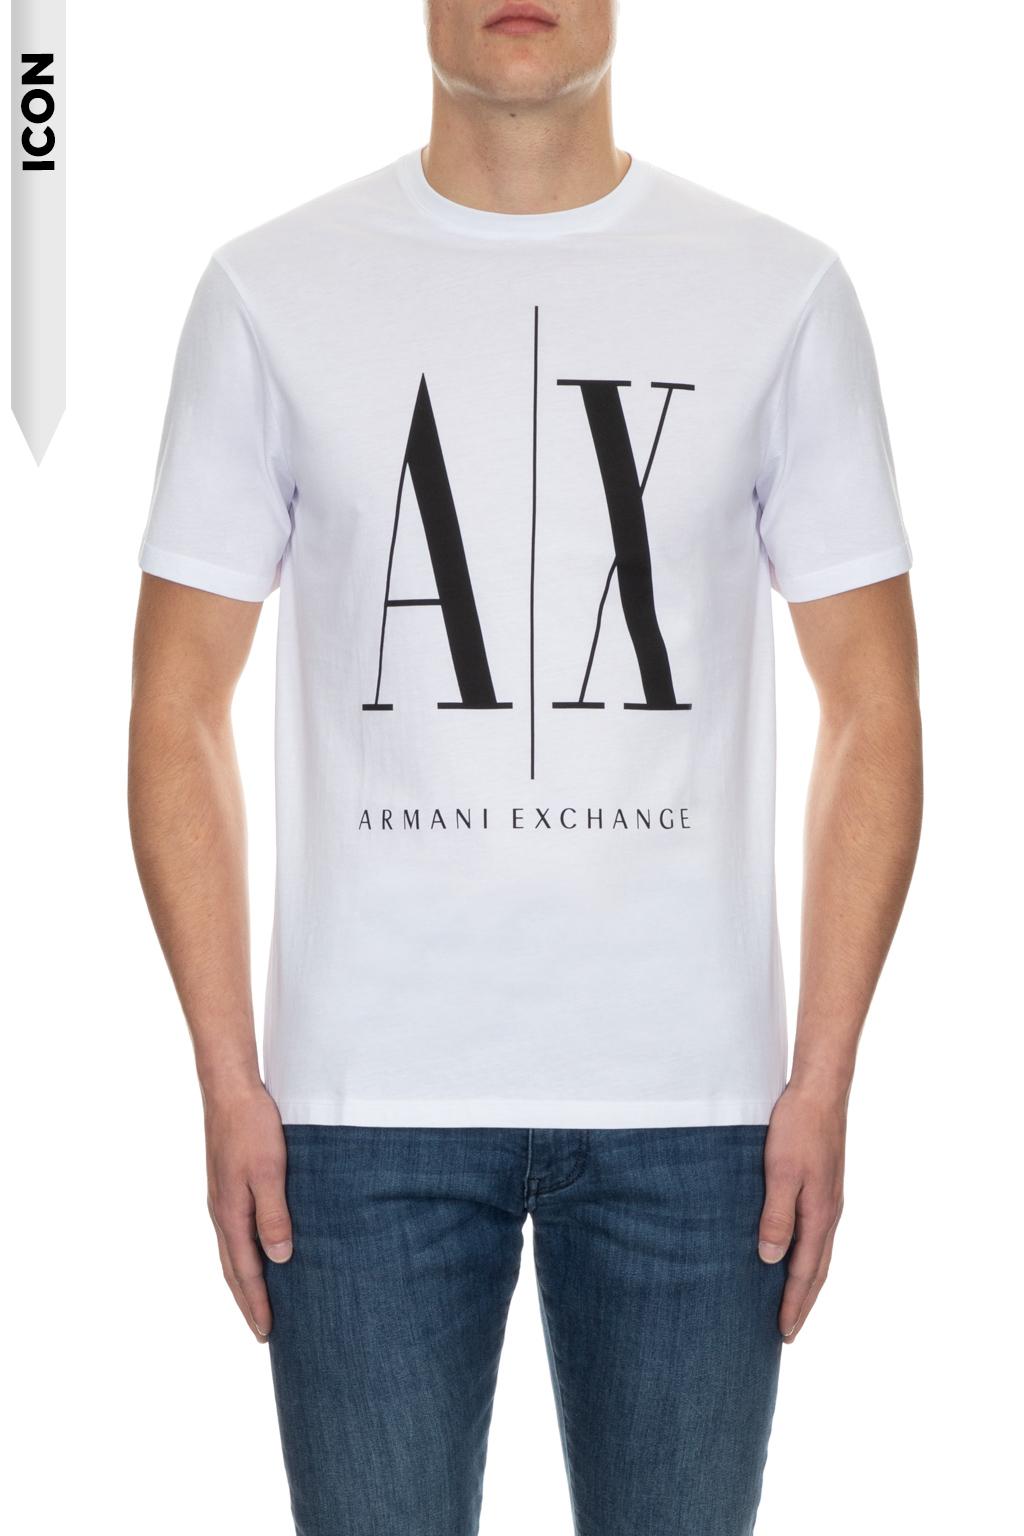 T-shirt manica corta uomo ARMANI EXCHANGE icon A/X